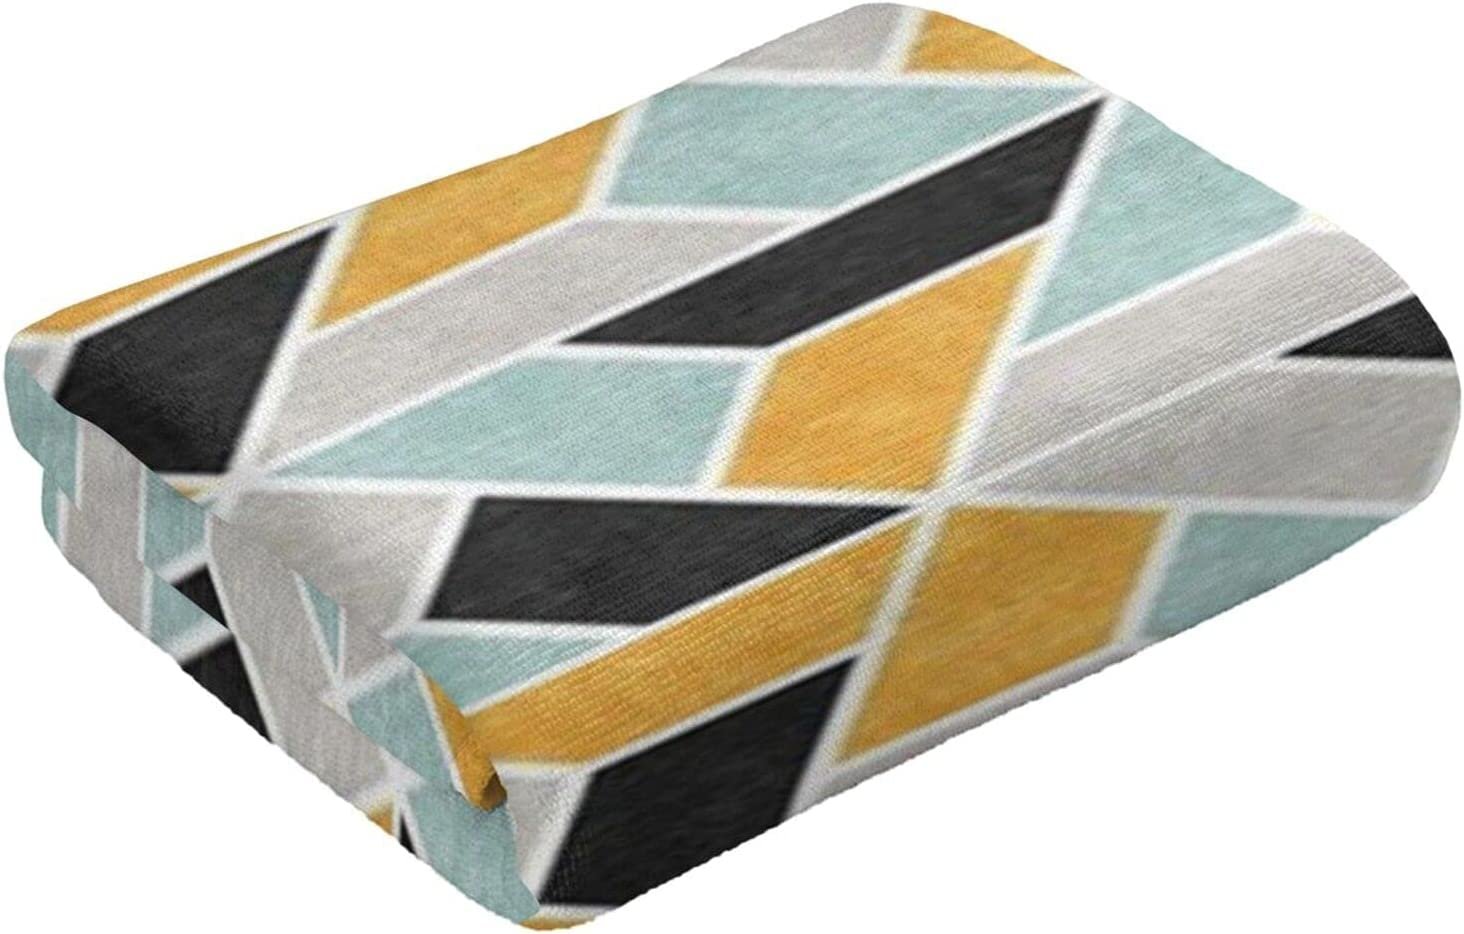 Towels Great interest Hand Cheap bargain Washcloths 27.5x12 Fingert Polyester Inch